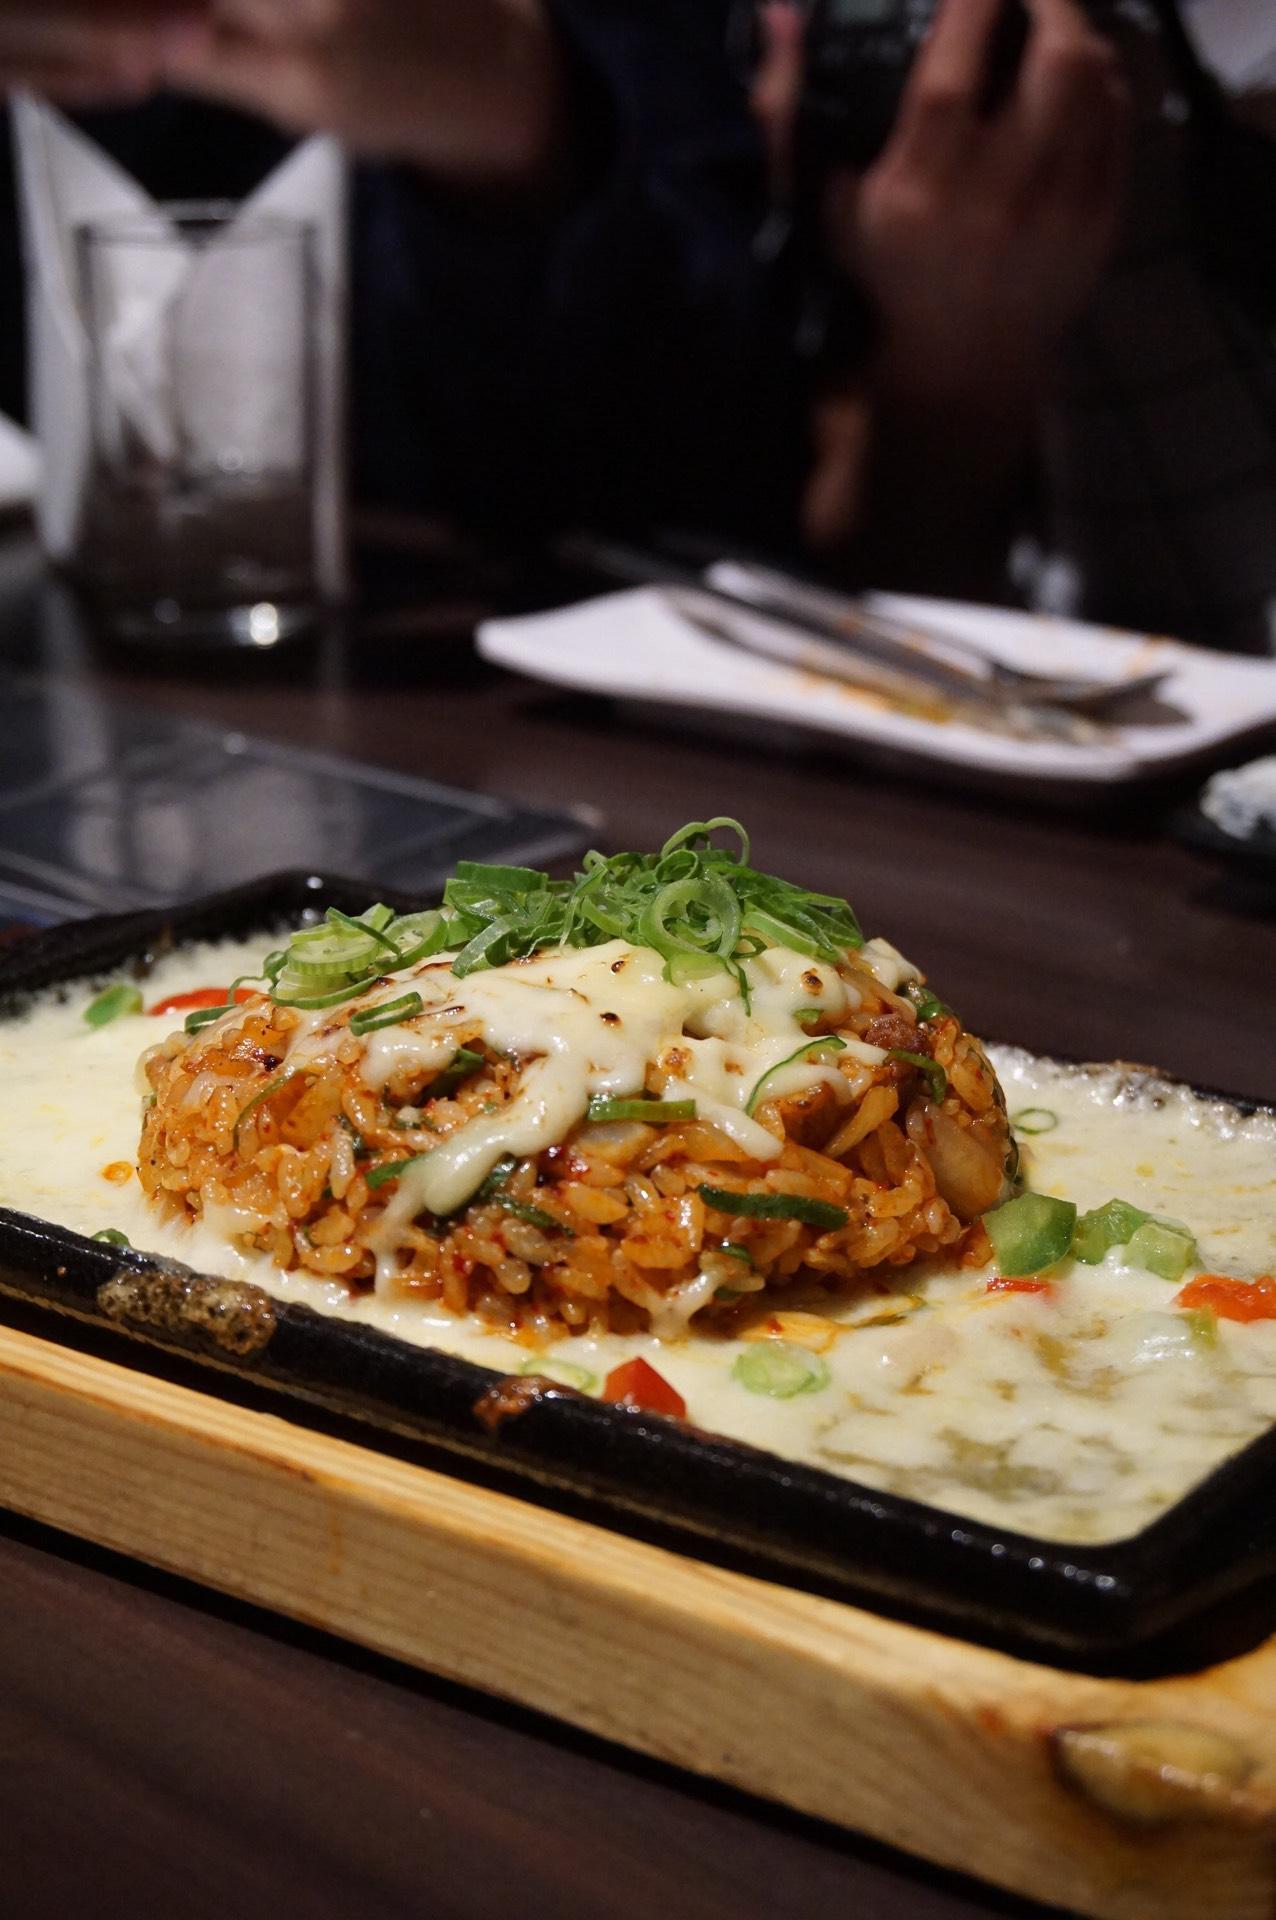 Kimcheese Fried Rice /김치 치즈 볶음밥 - $23